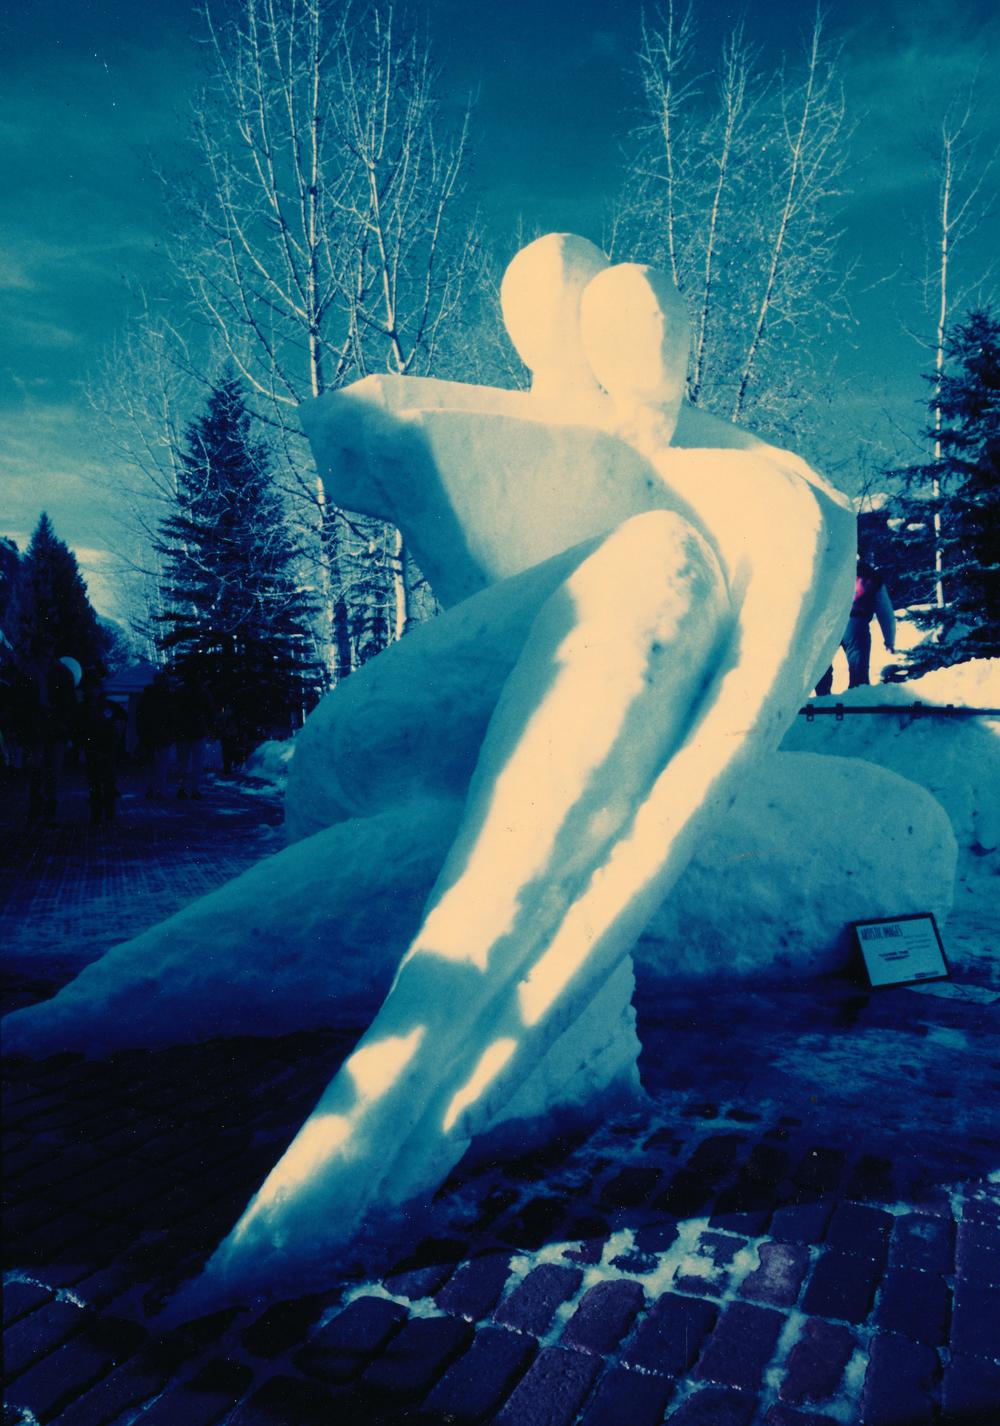 thomas-barlow_snow_twofigures.jpg